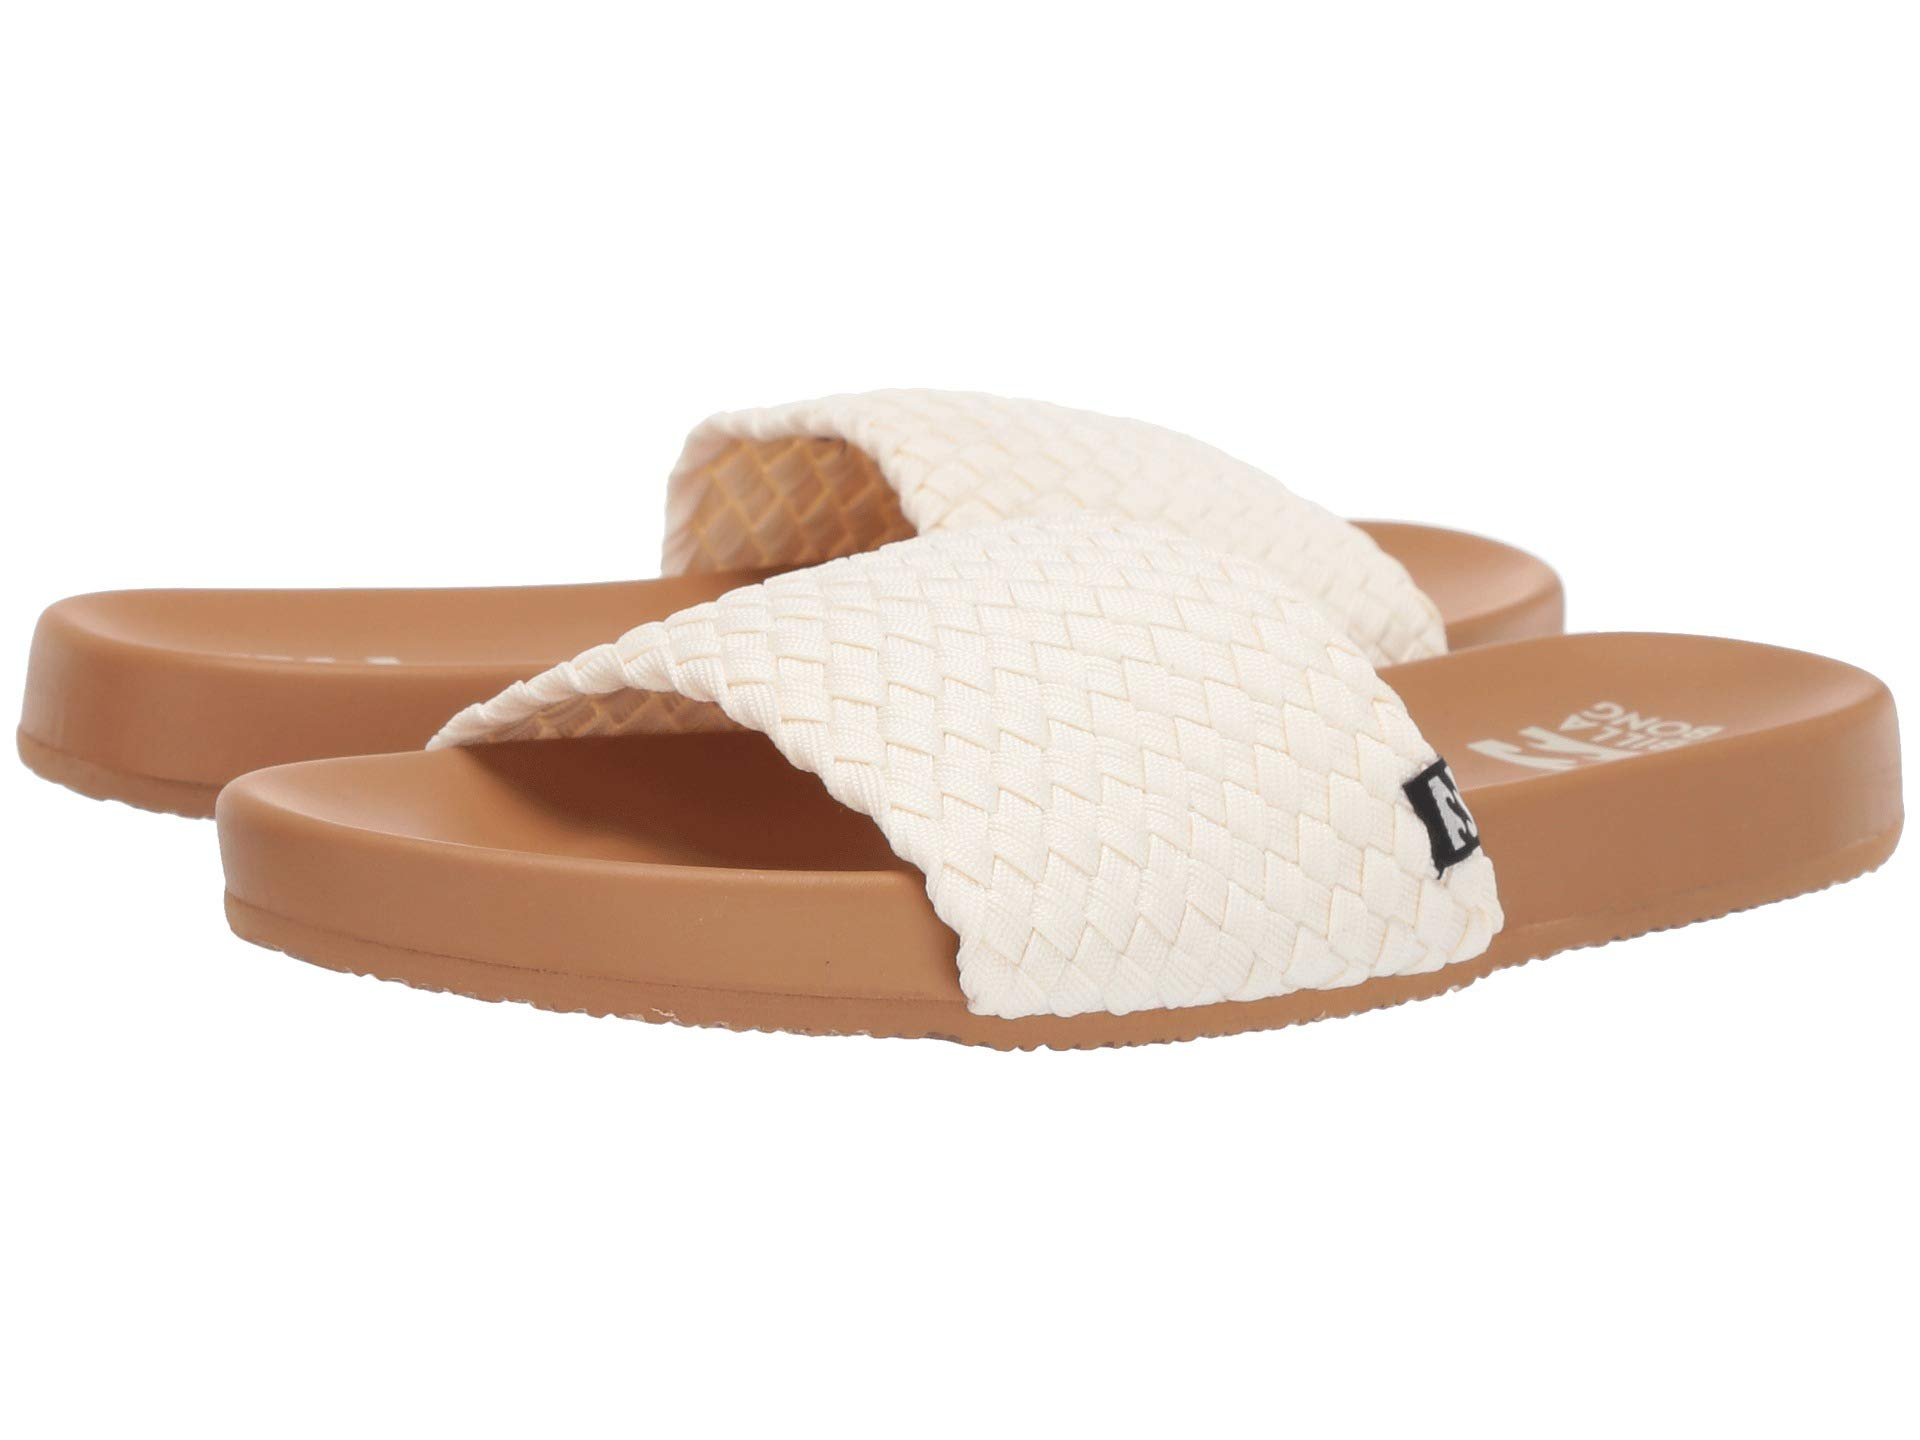 9idywh2e Sandals En Billabong Retre Nural Surf yNnwOPv08m